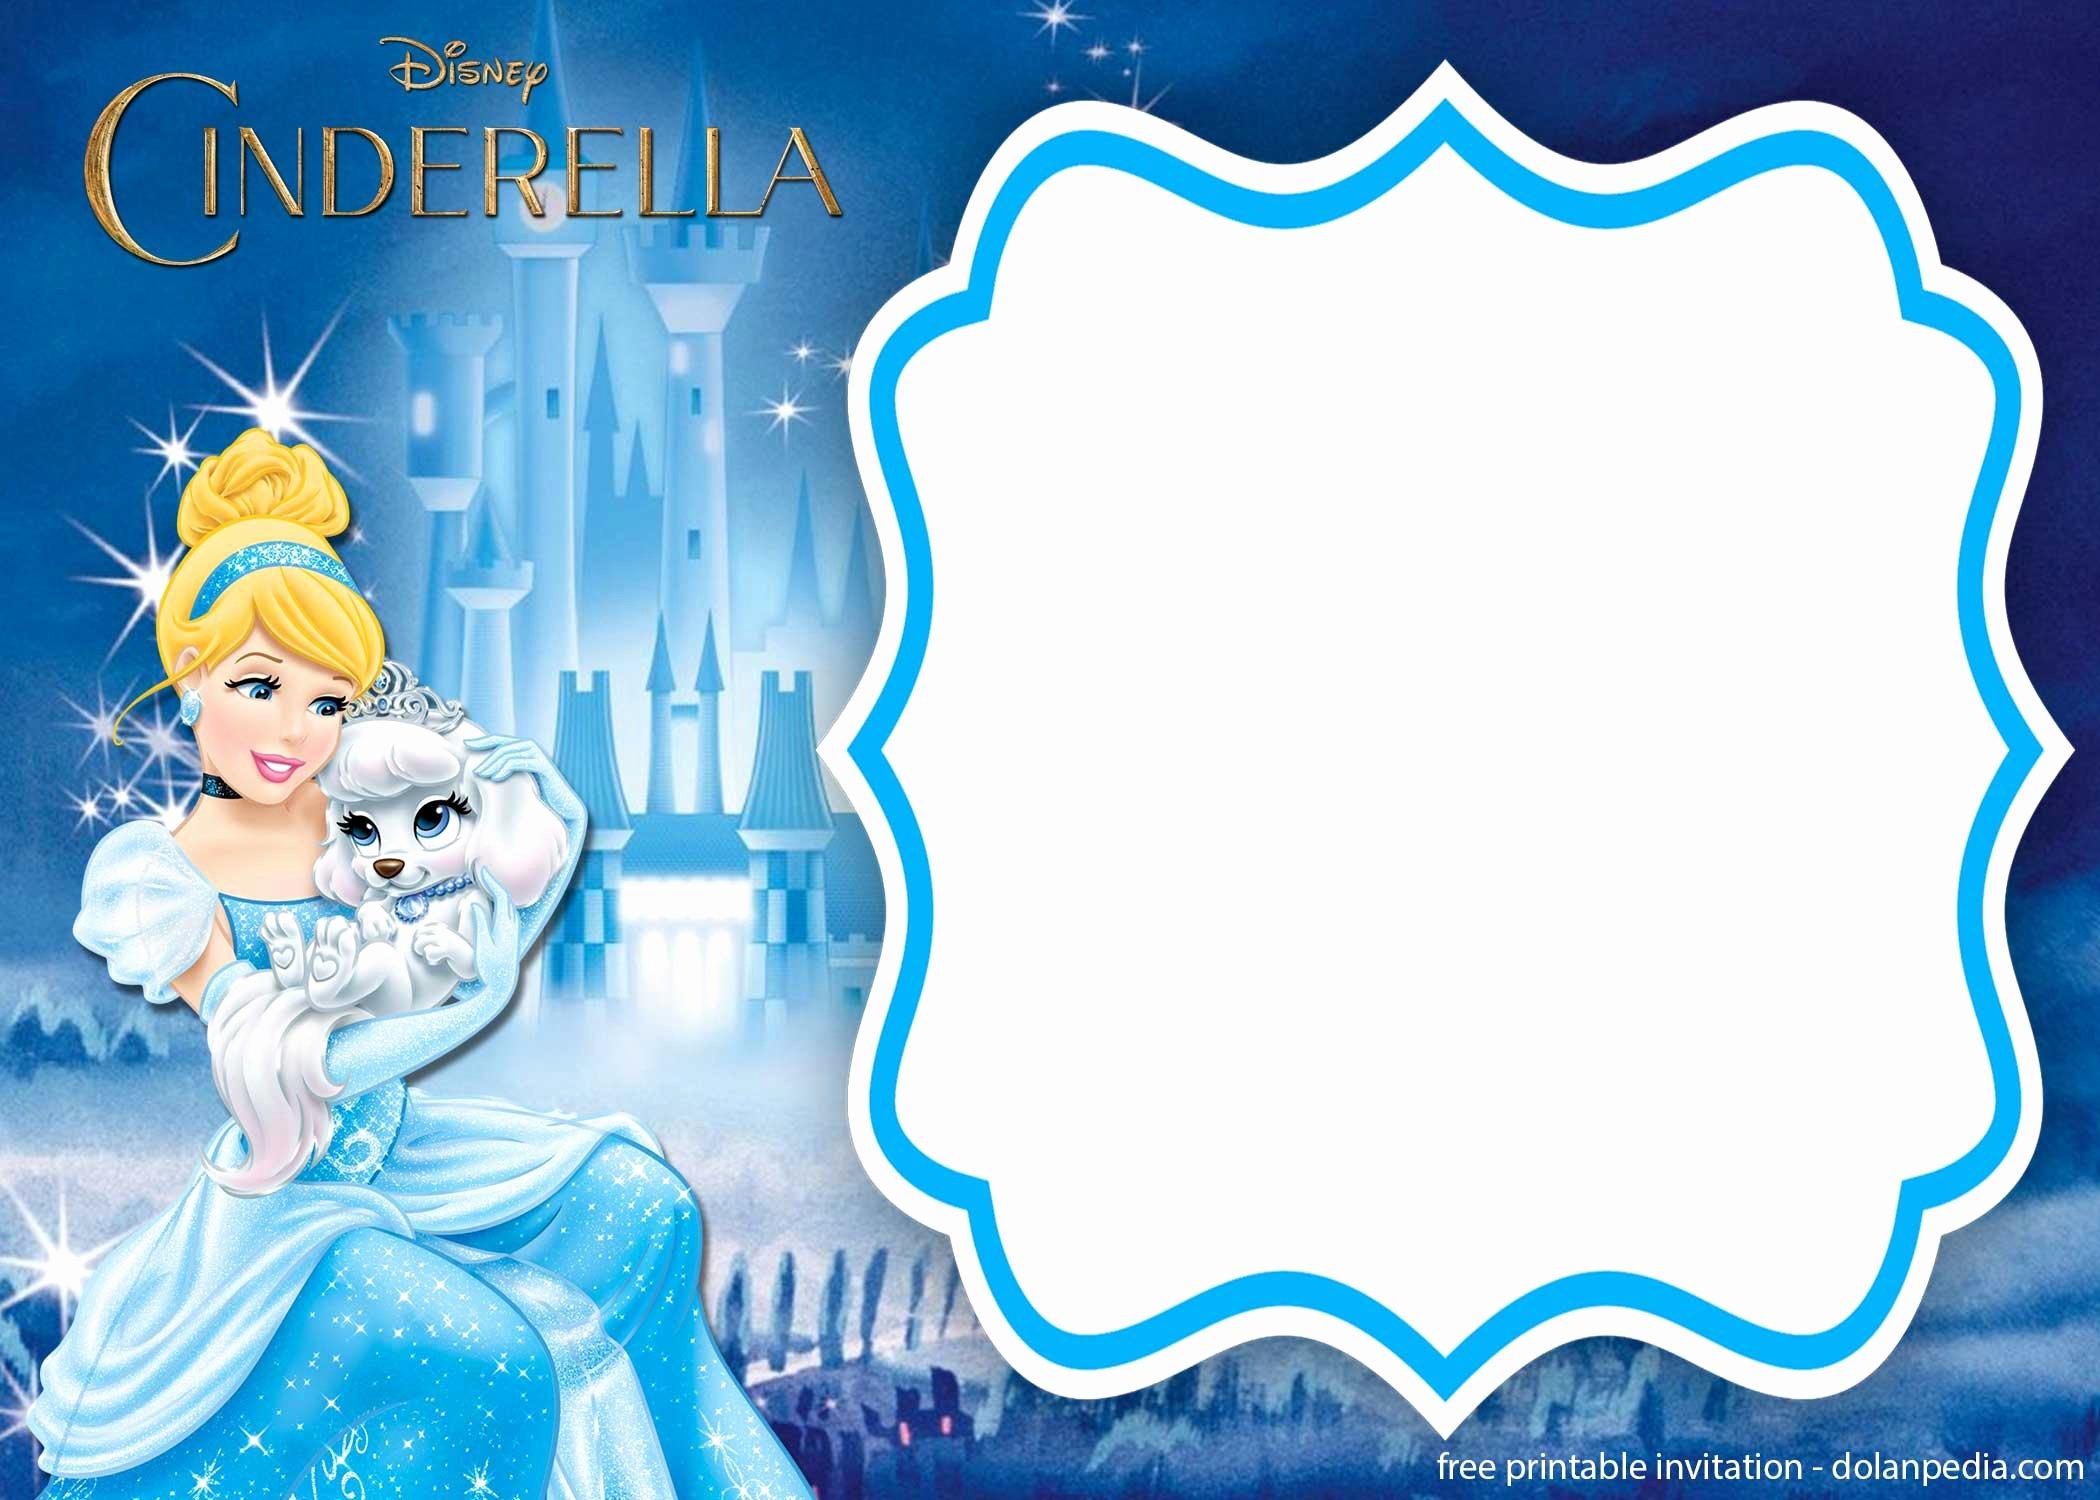 Cinderella Invitation Template Free Beautiful Free Printable Cinderella Royal Invitation Templates